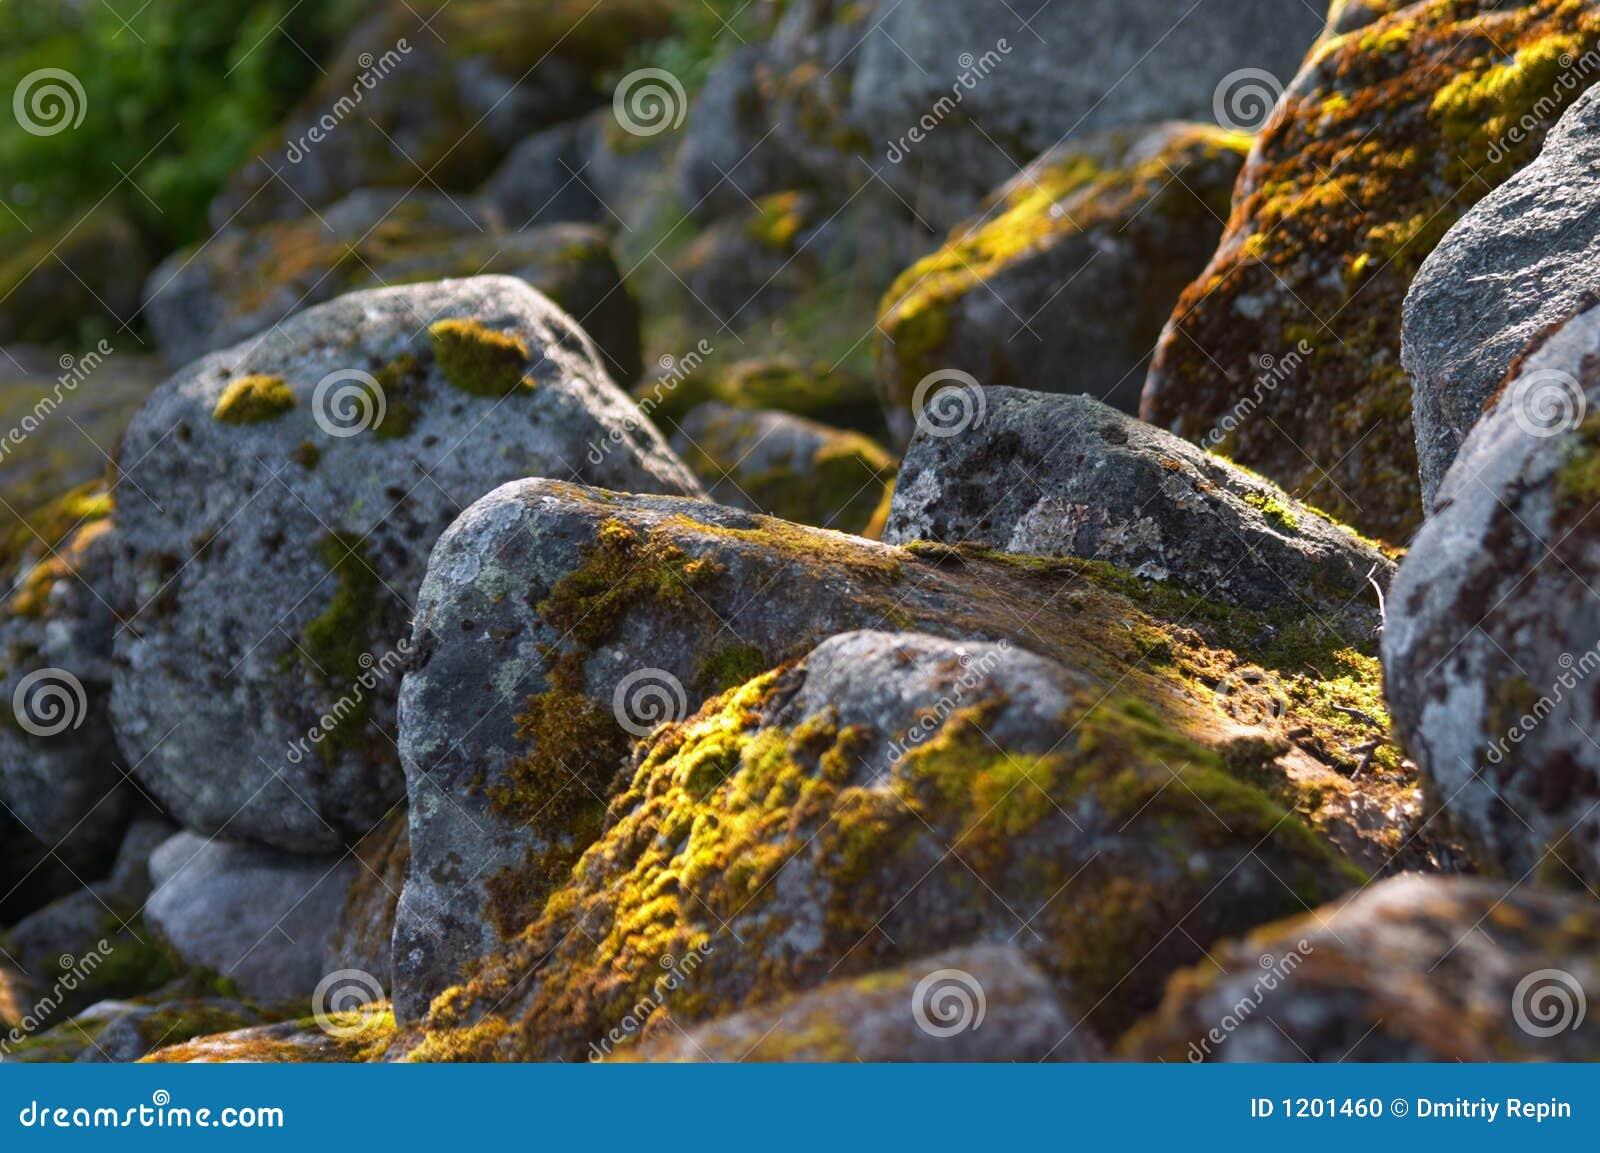 Northern stones